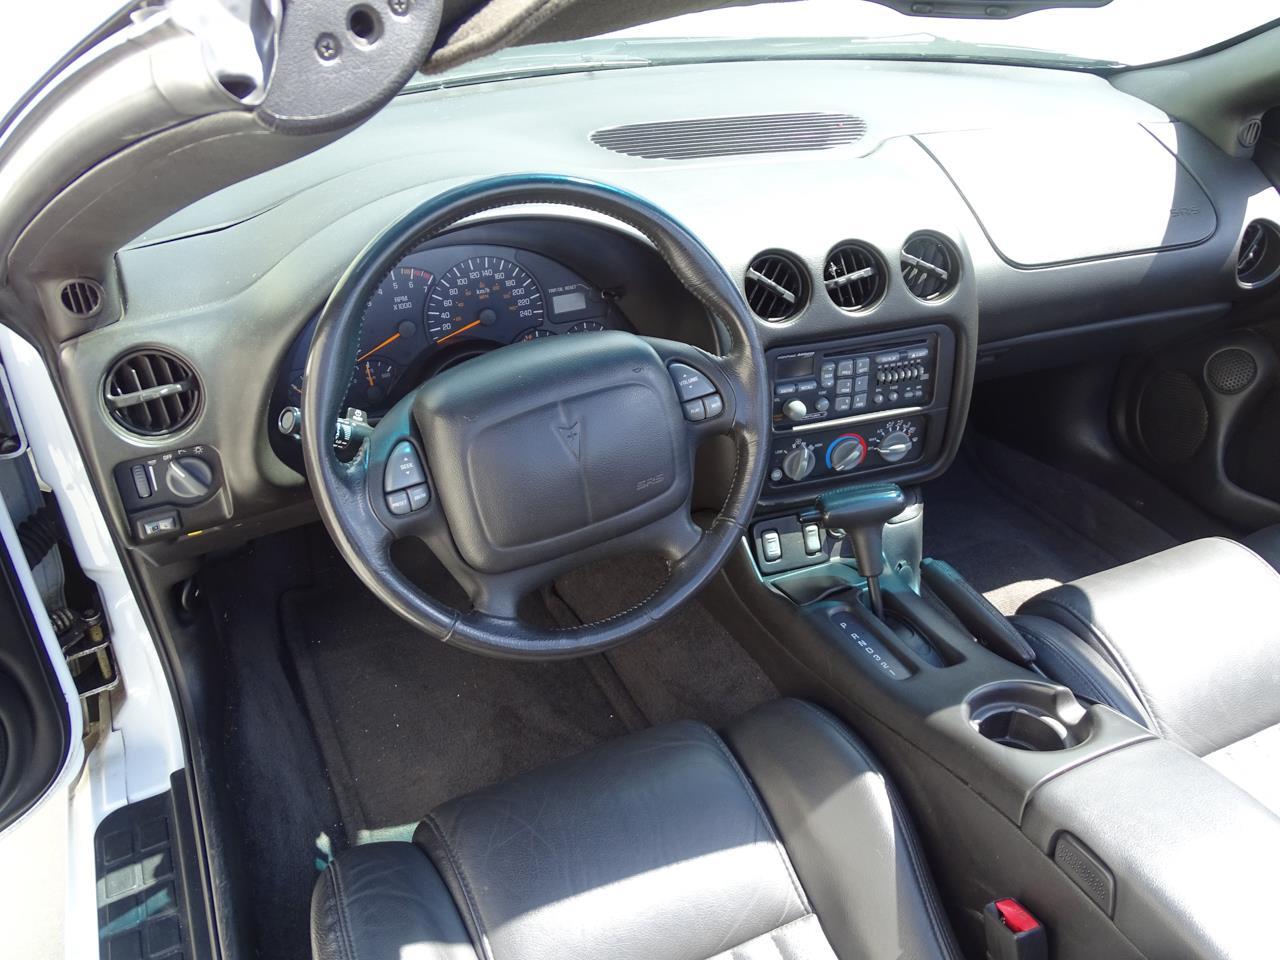 2000 Pontiac Firebird Trans Am (CC-1419957) for sale in O'Fallon, Illinois